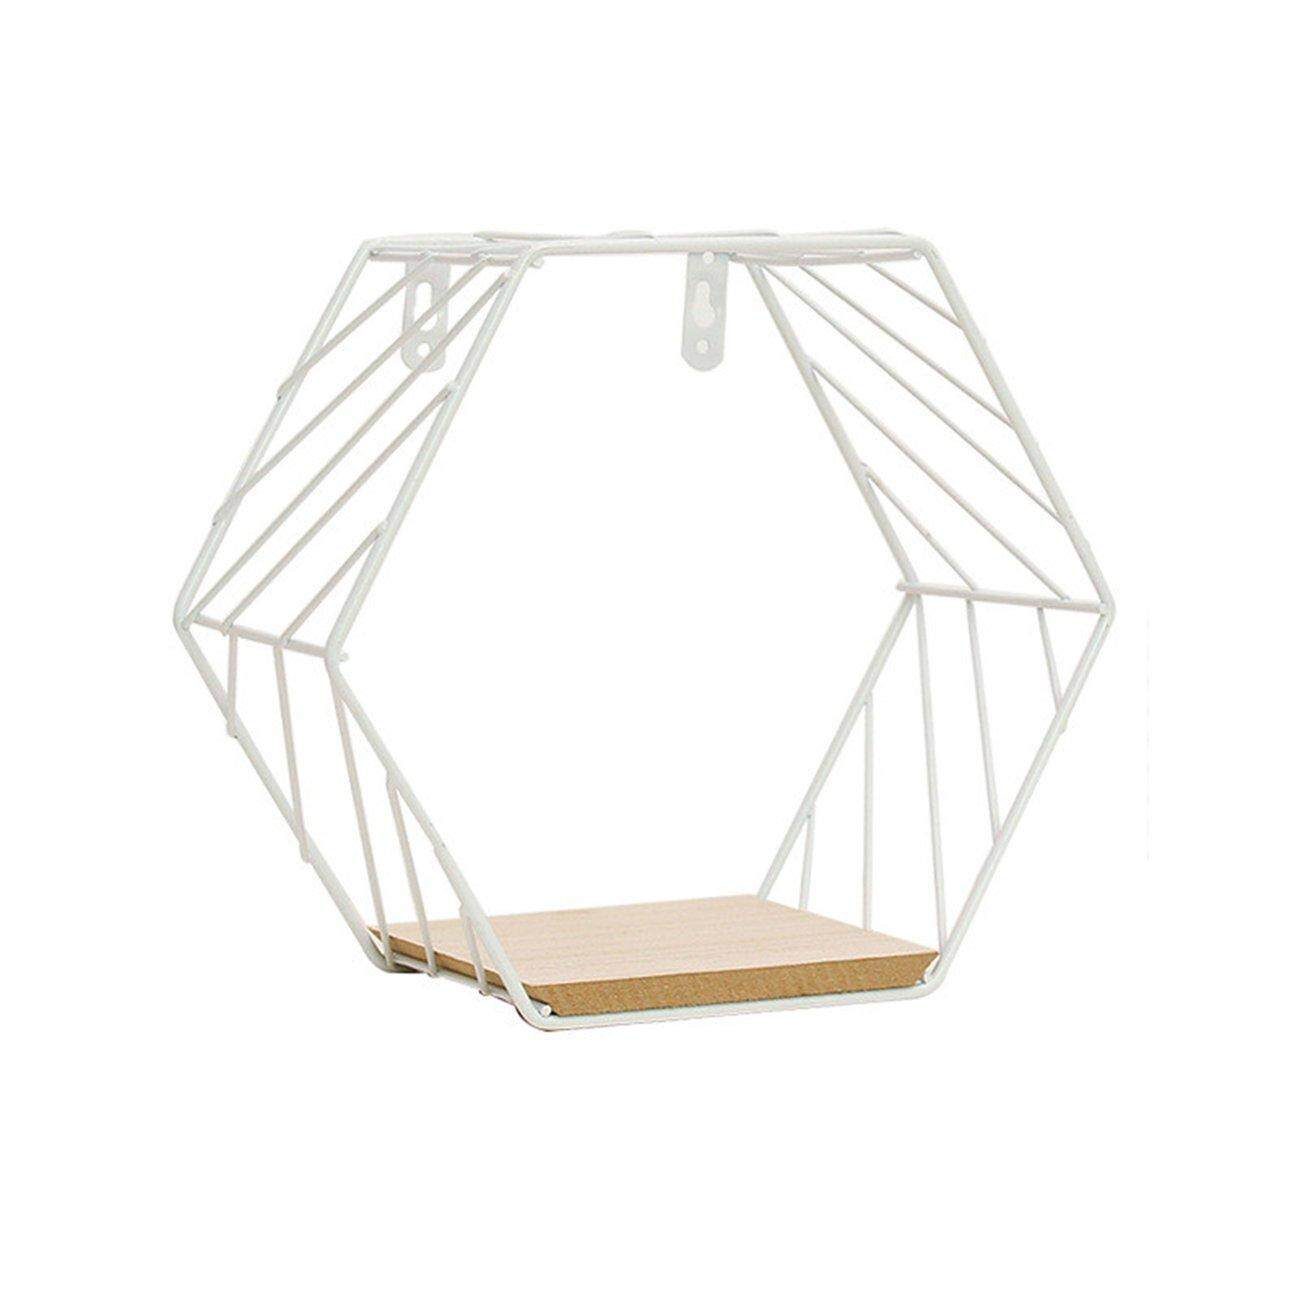 Hot Deals Geometric Iron Wall Shelf Wall Mounted Storage Rack Organization For Bedroom